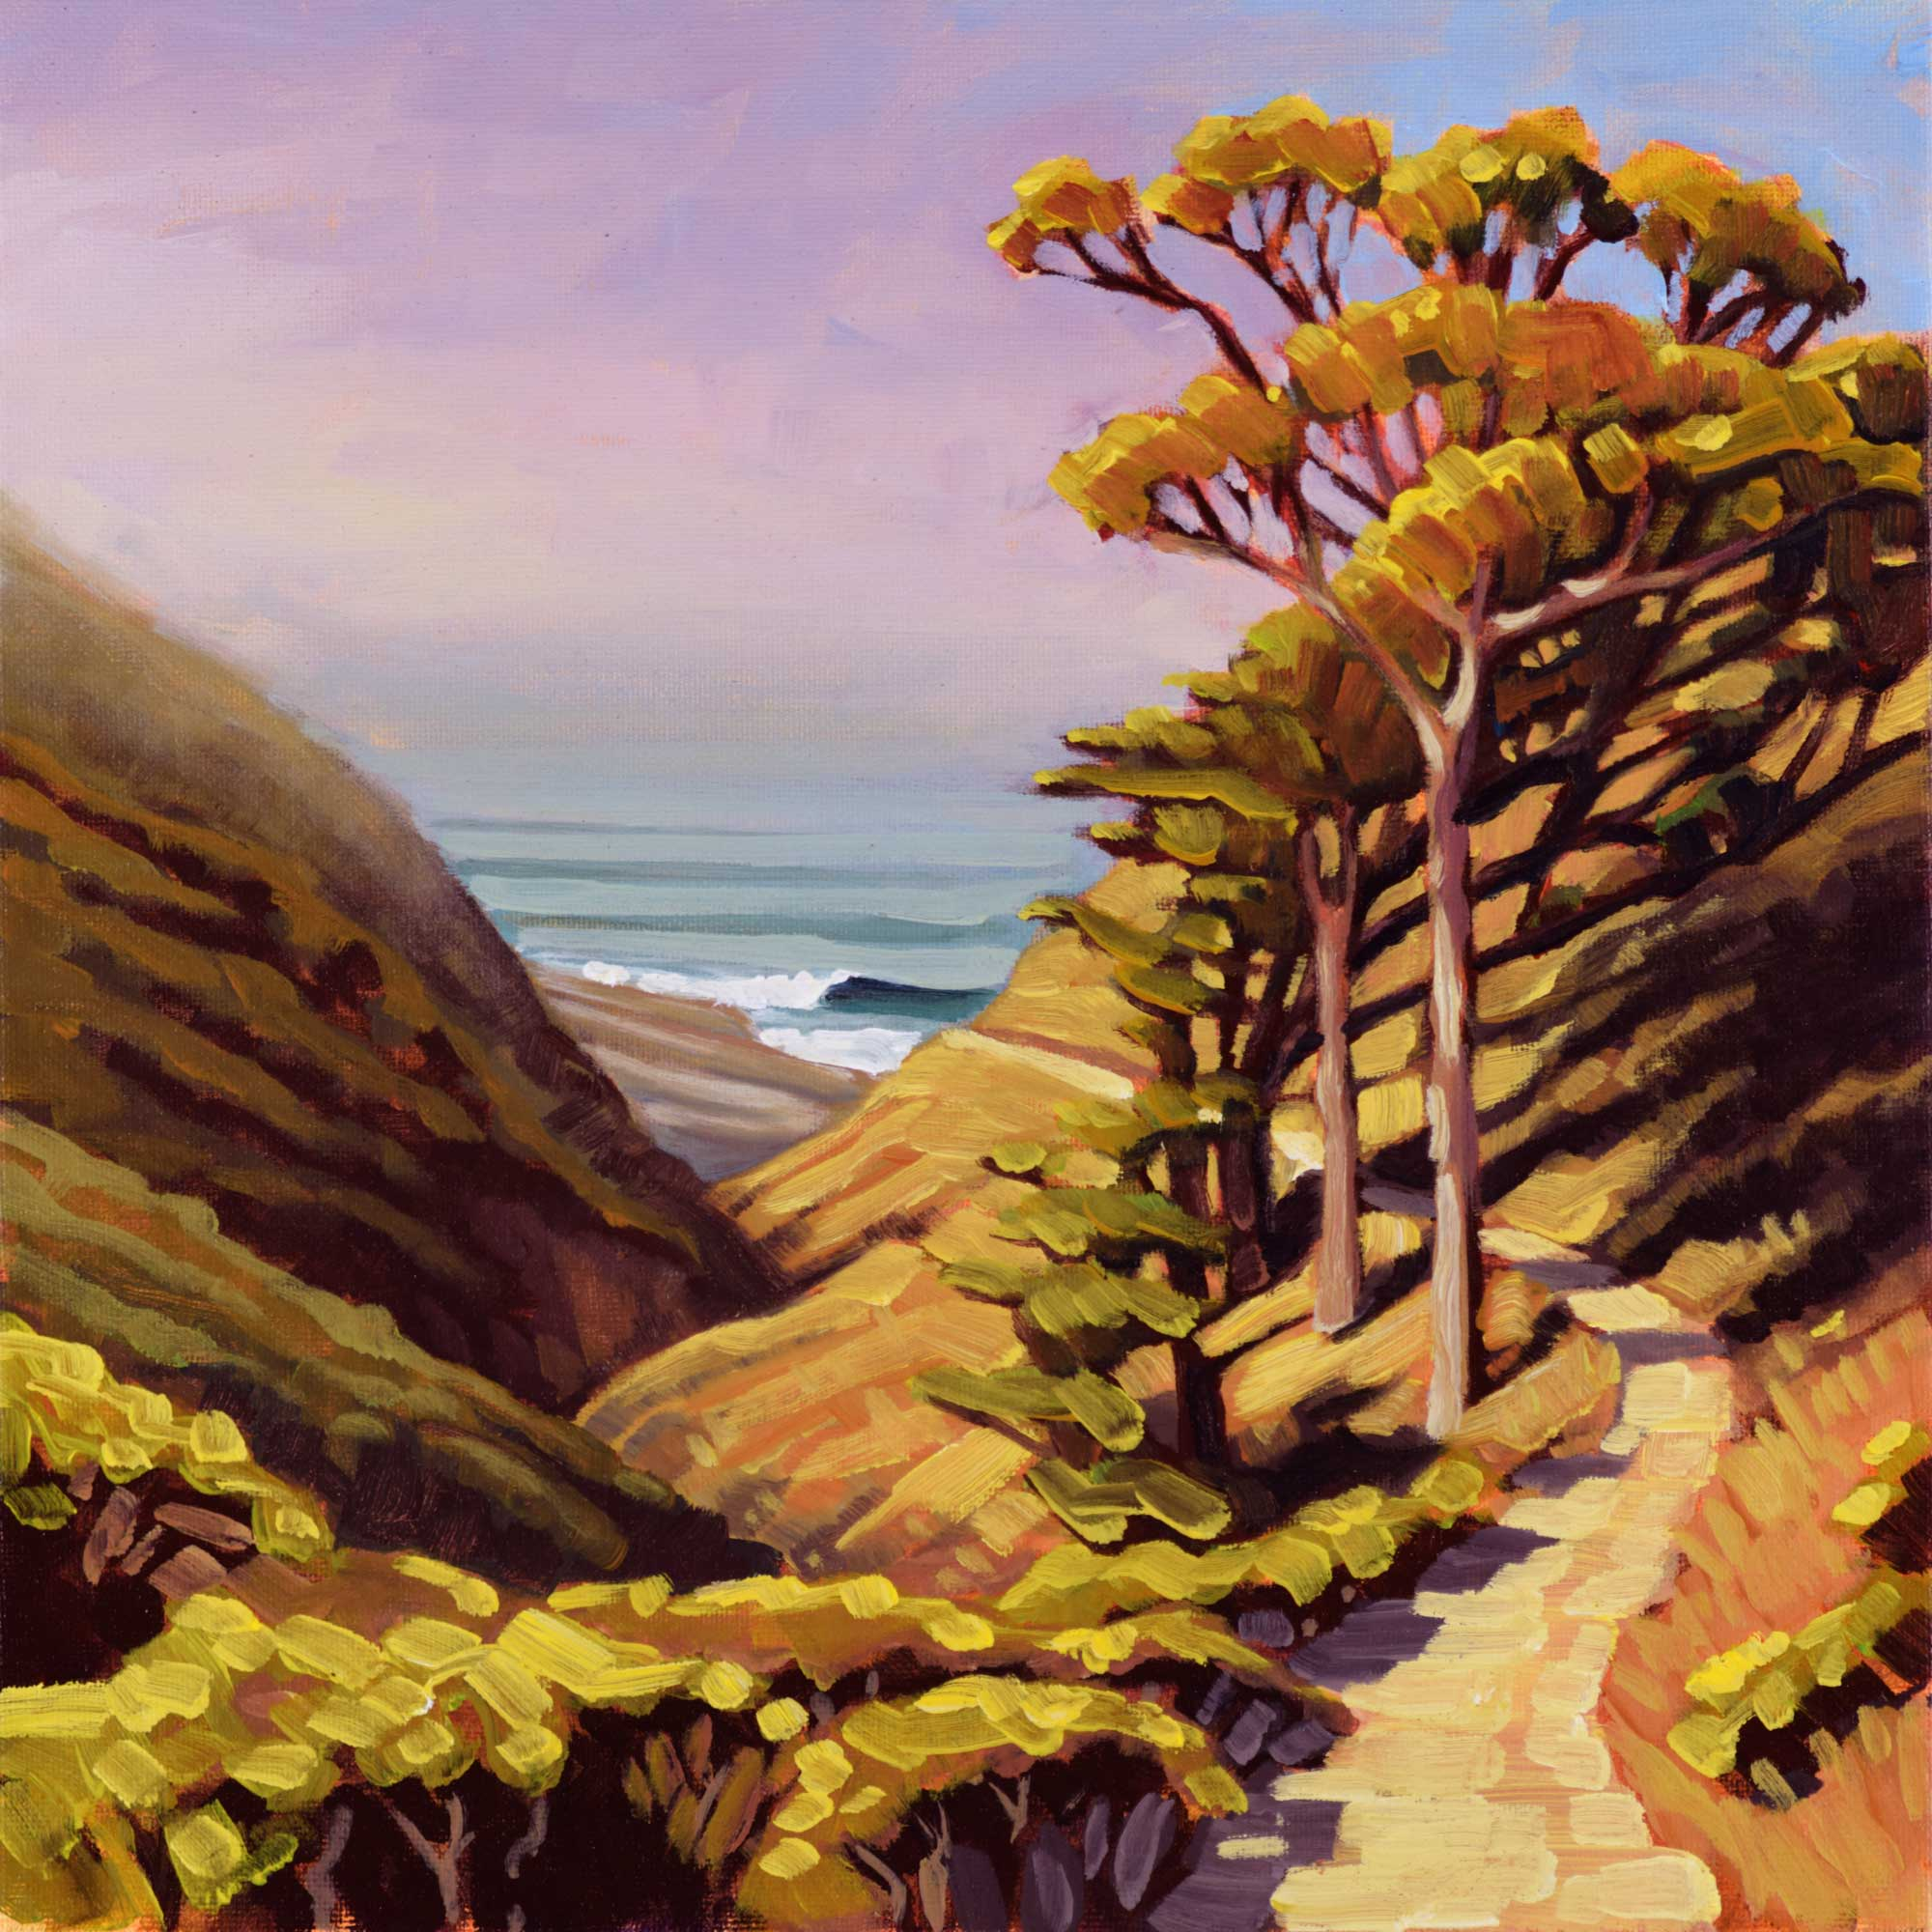 Plein air artwork of the coastal trail at Harmony headlands on the San Luis Obispo county coast of central California